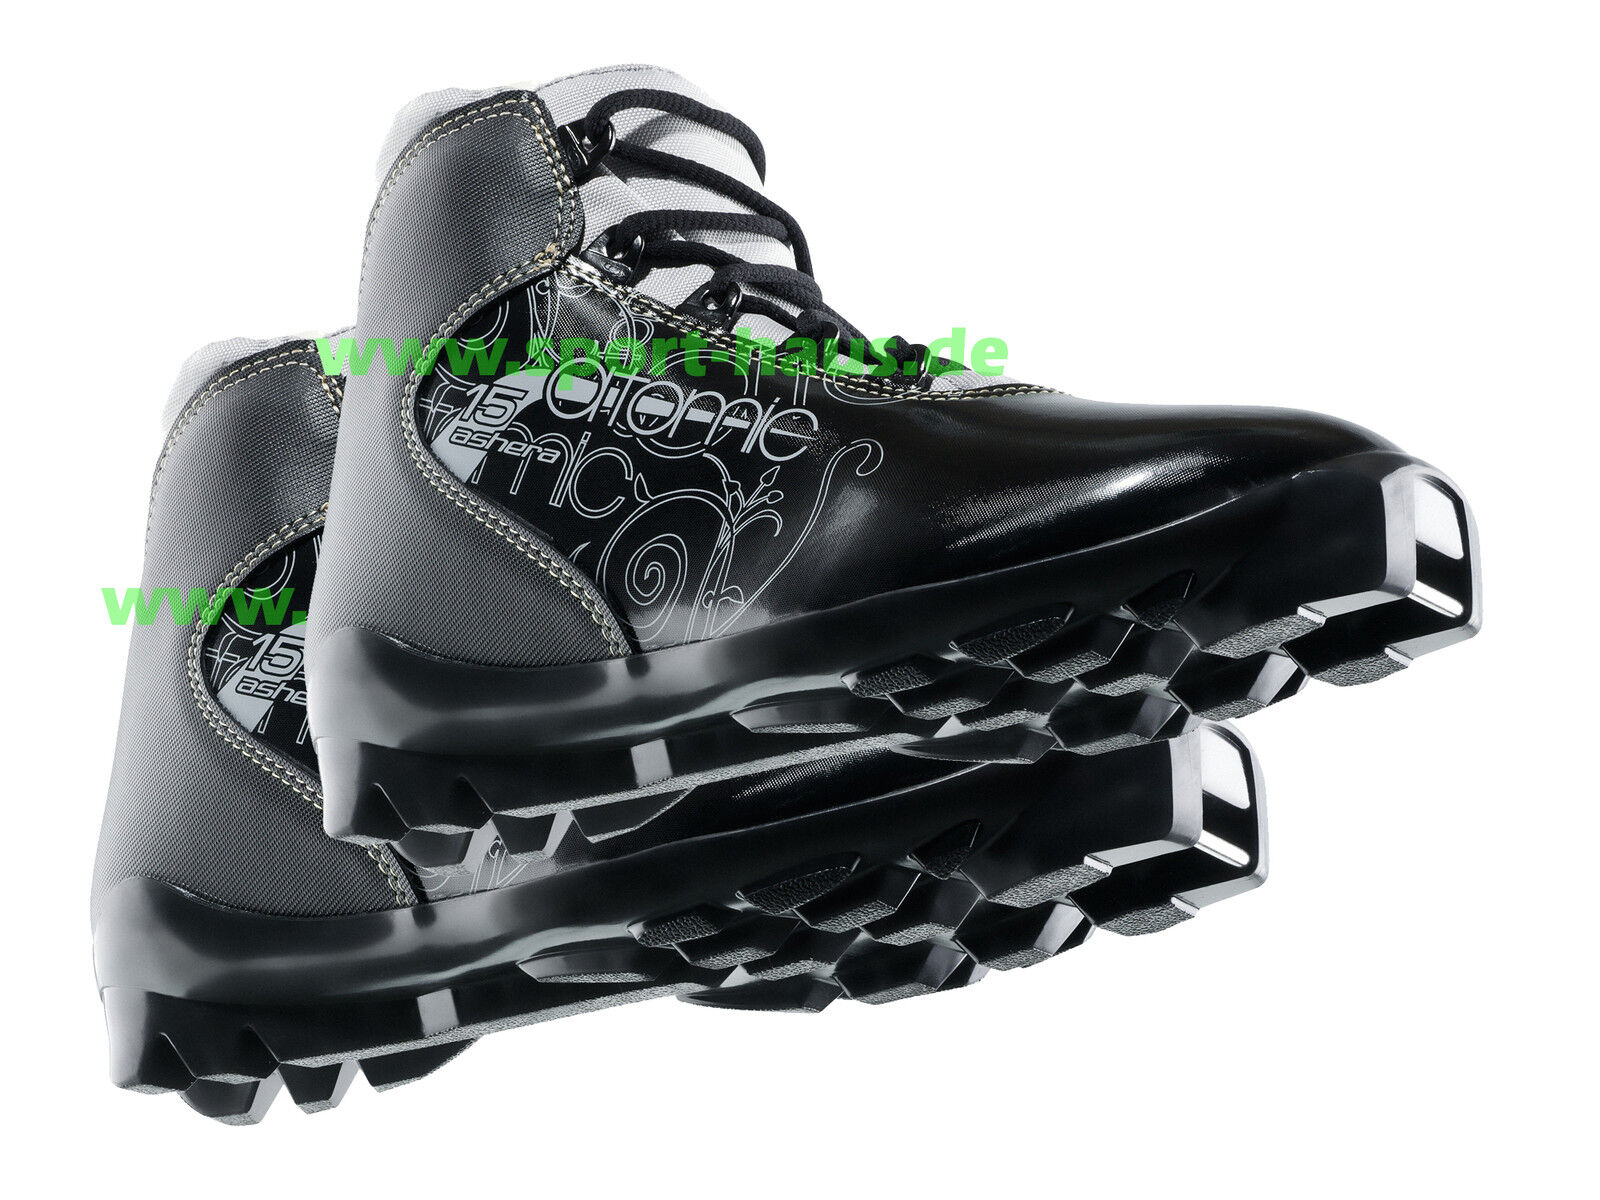 Atomic Ashera 15 - Gr.  3,5 - Nordic Langlauf Schuh mit SNS Sohle - Klassiker -  | Online Shop